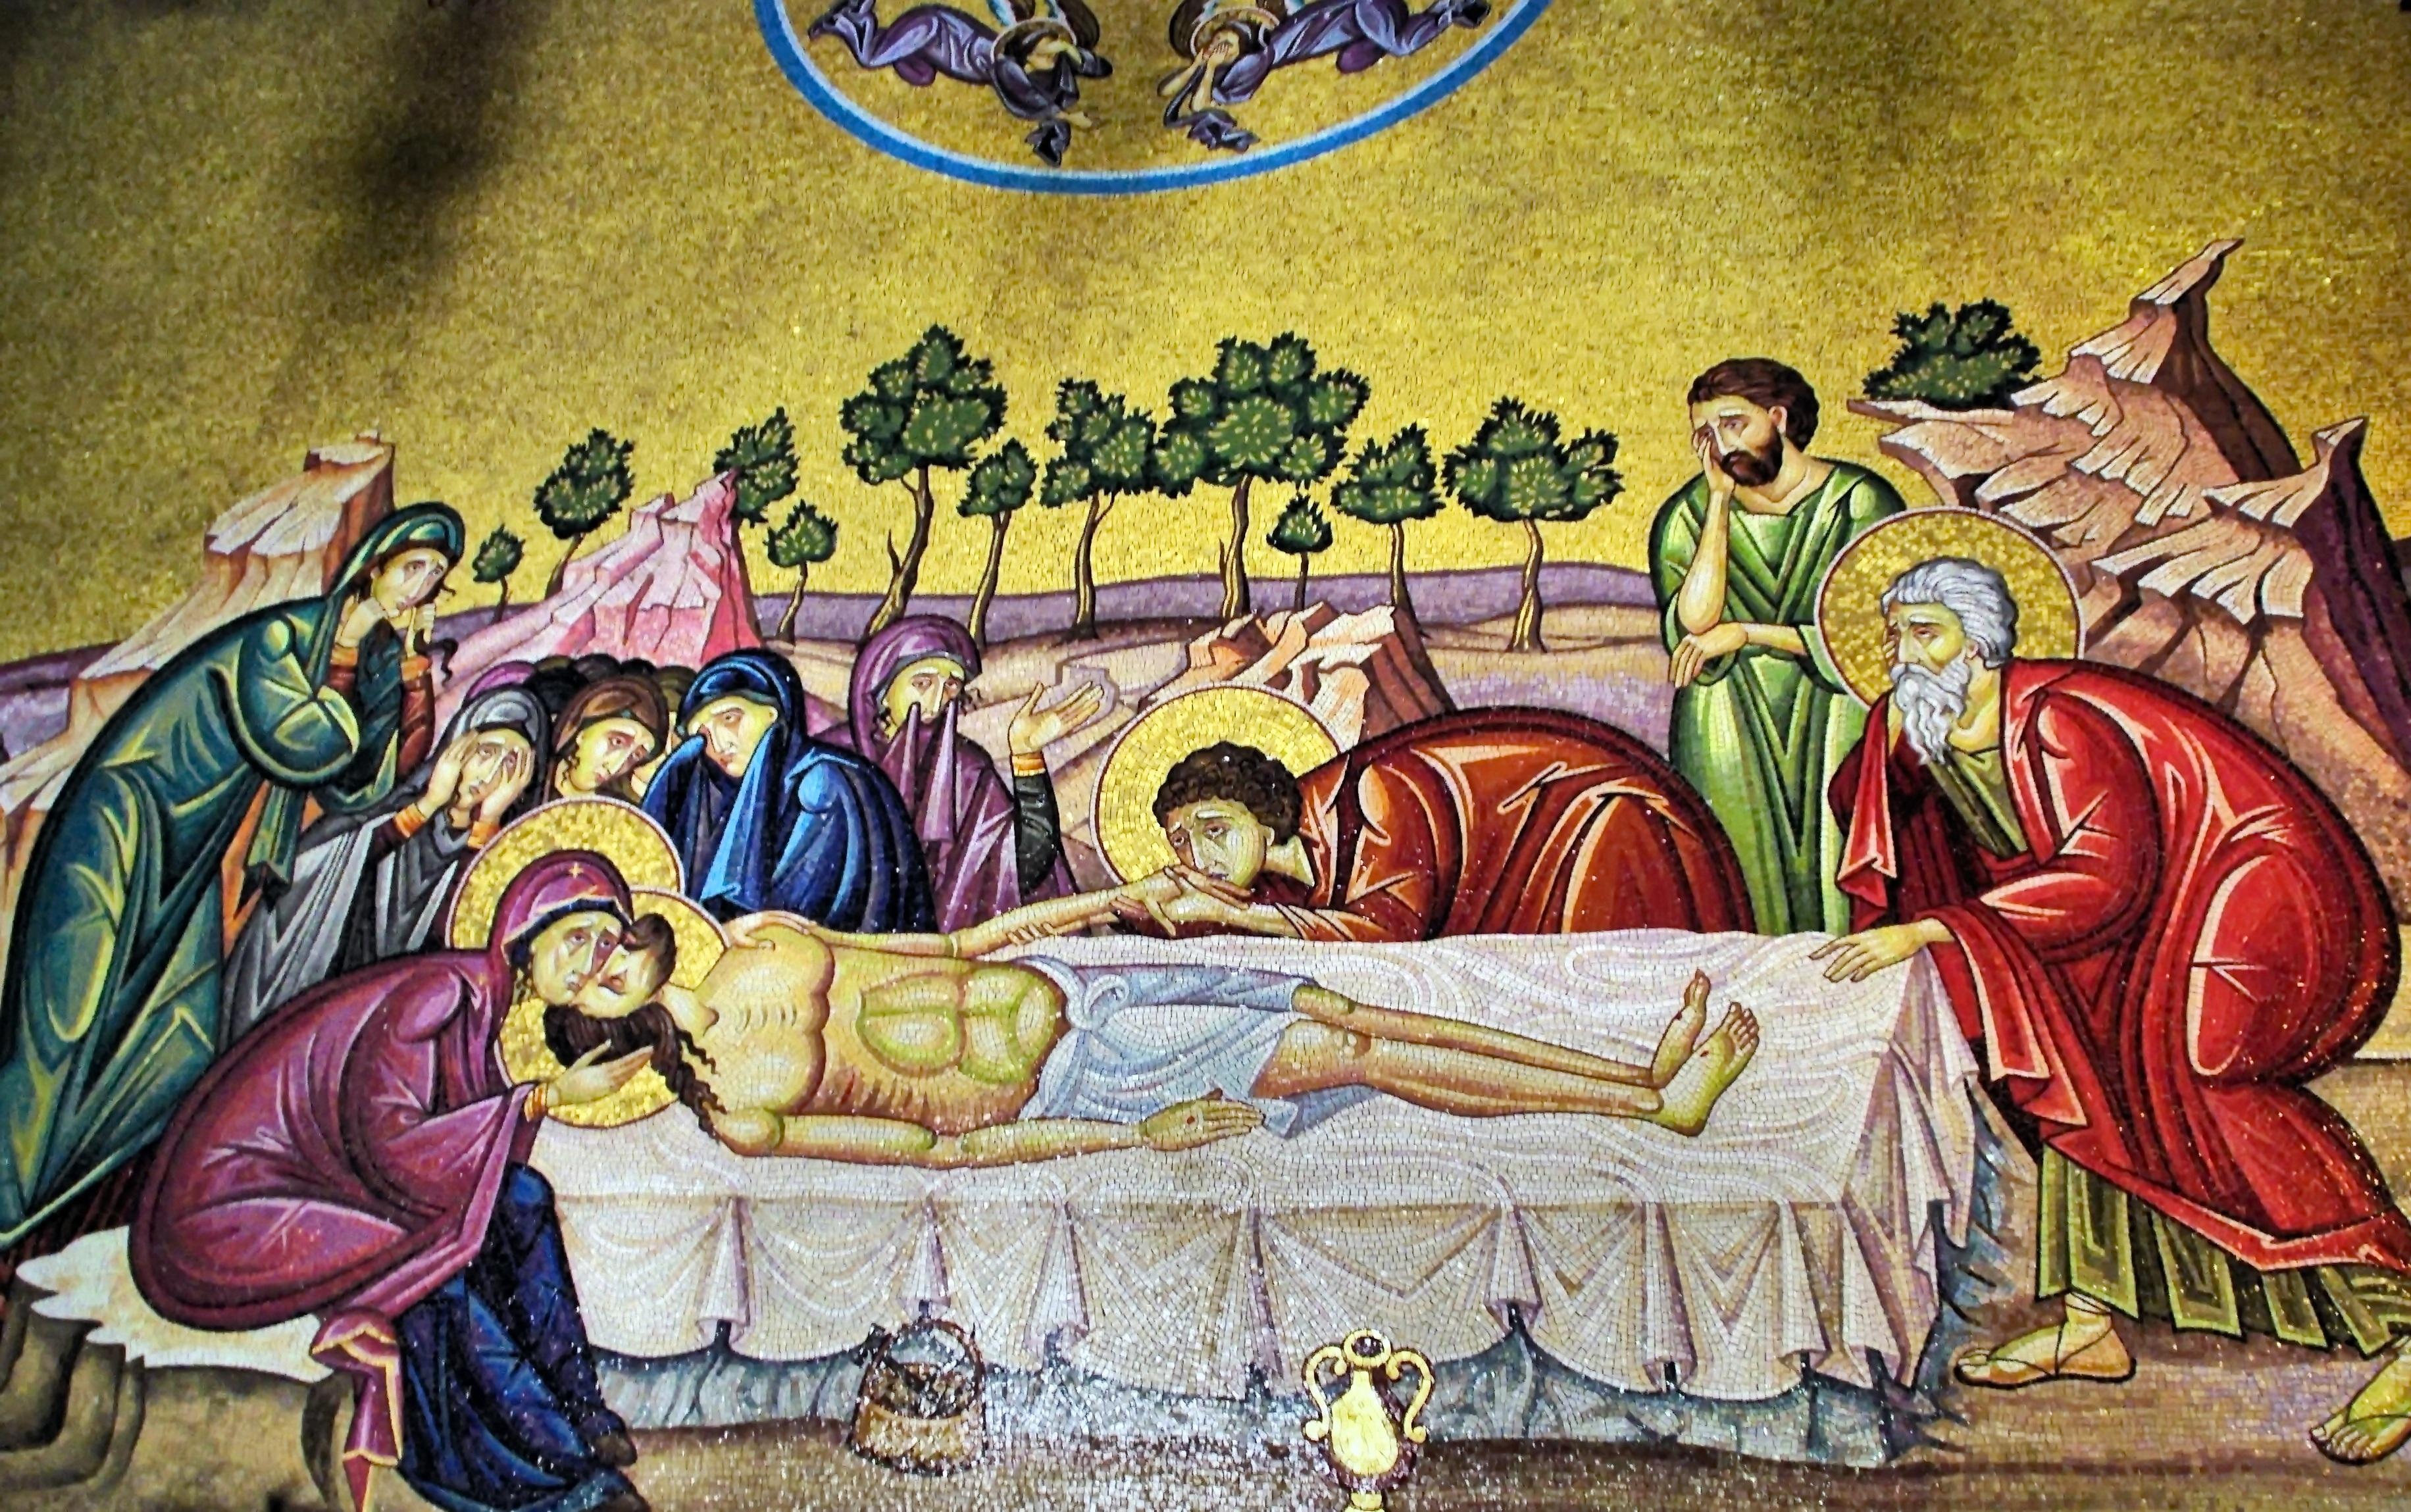 Gambar Agama Alkitab Kristus Seni Ilustrasi Iman Mosaik